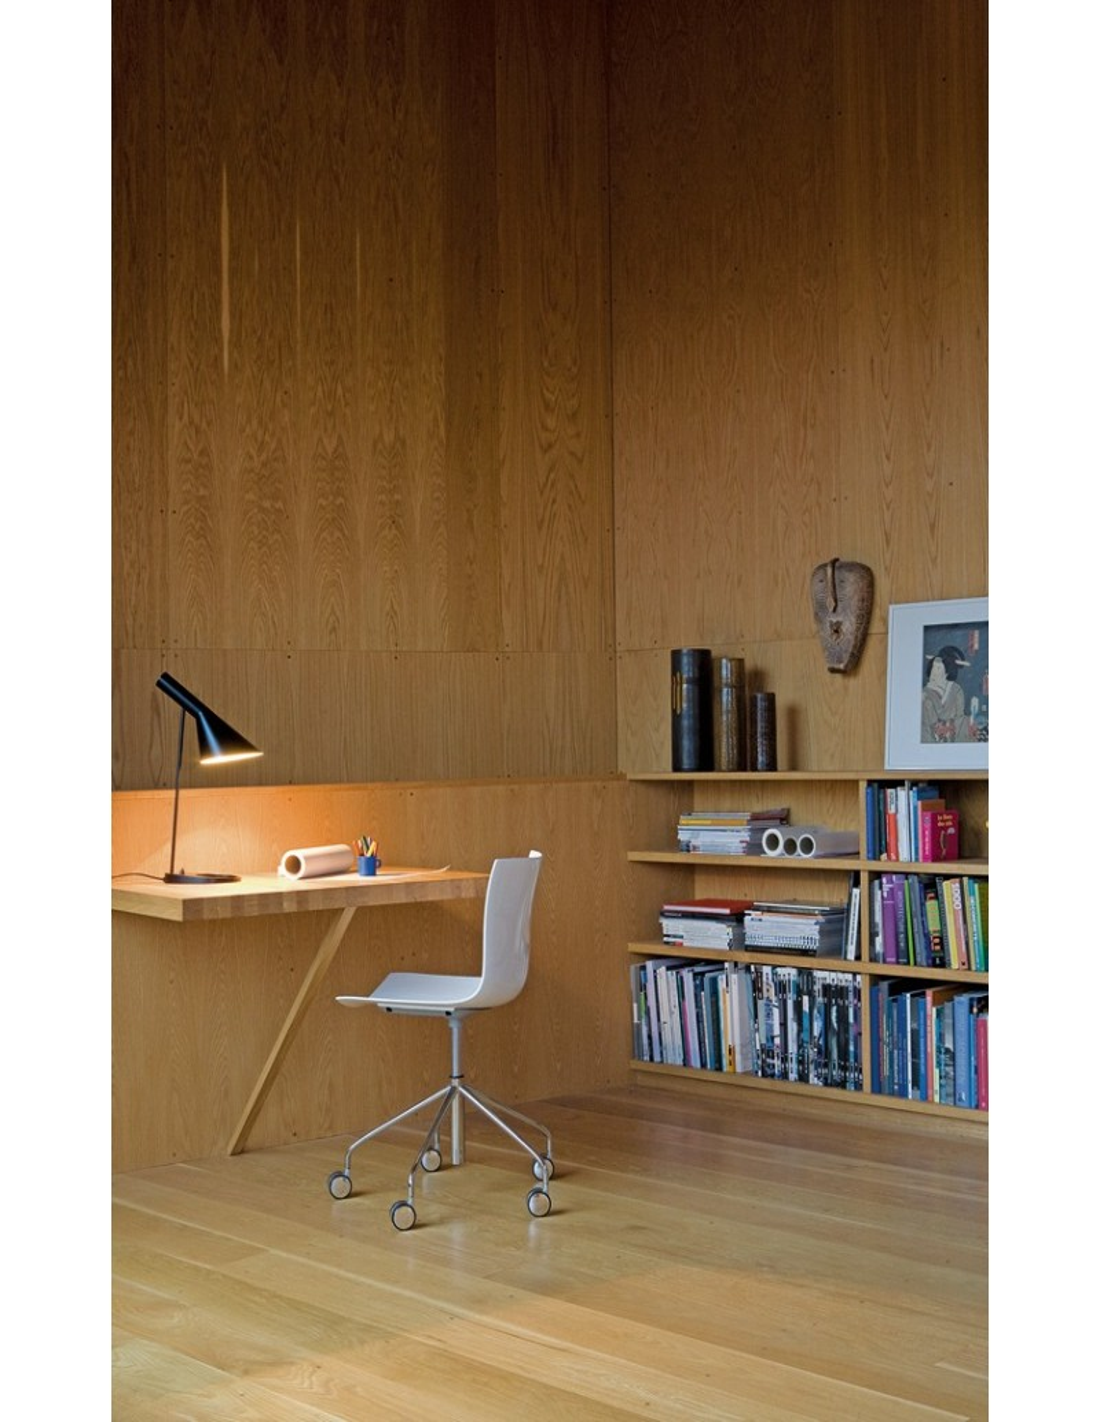 aj table lamp arne jacobsen design for louis poulsen la. Black Bedroom Furniture Sets. Home Design Ideas